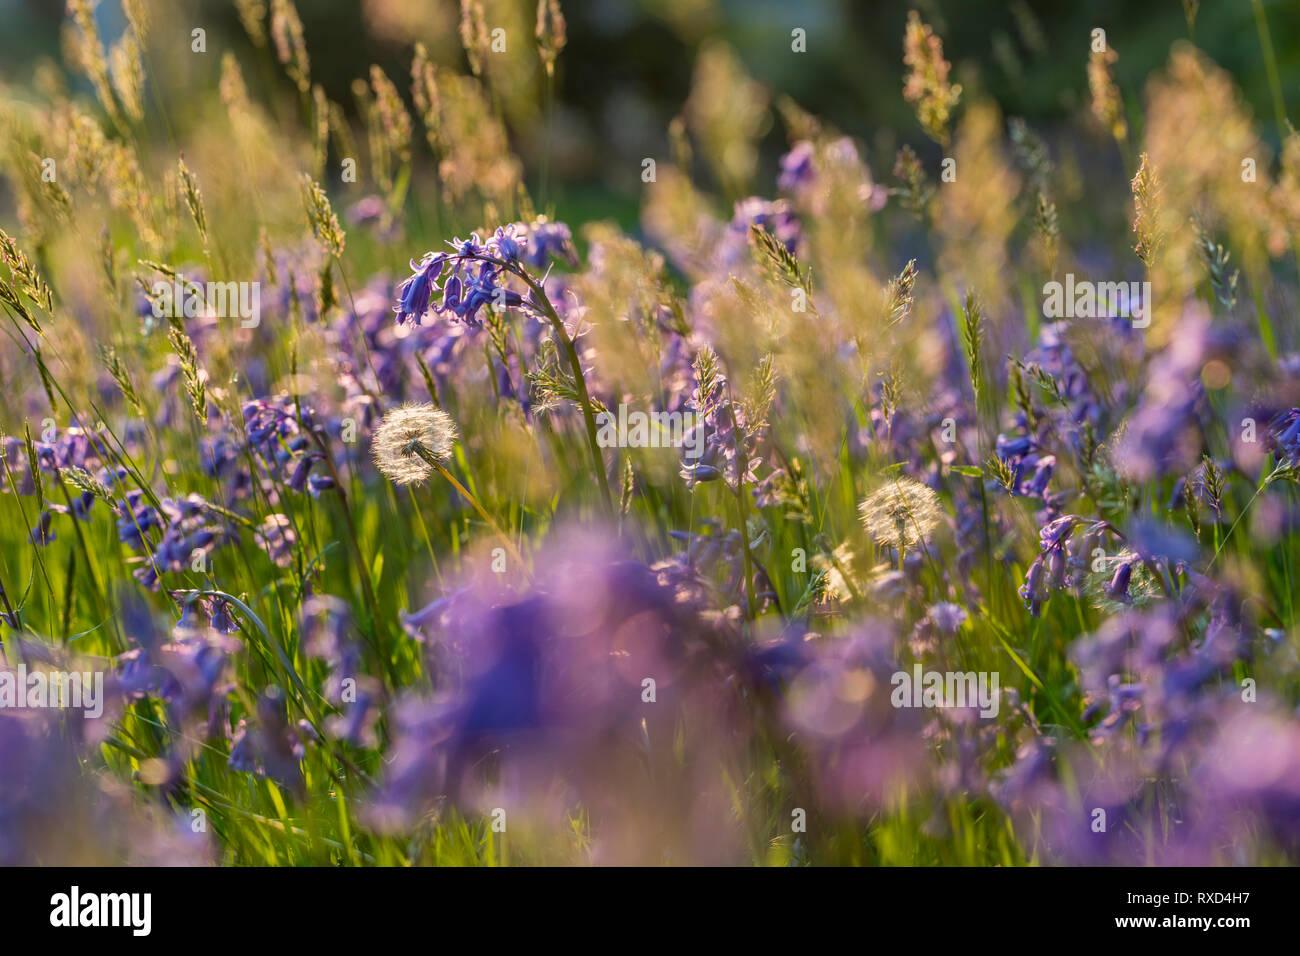 Dandelion Seedhead; Taraxacum officinale; with Bluebells; Cornwall; UK - Stock Image